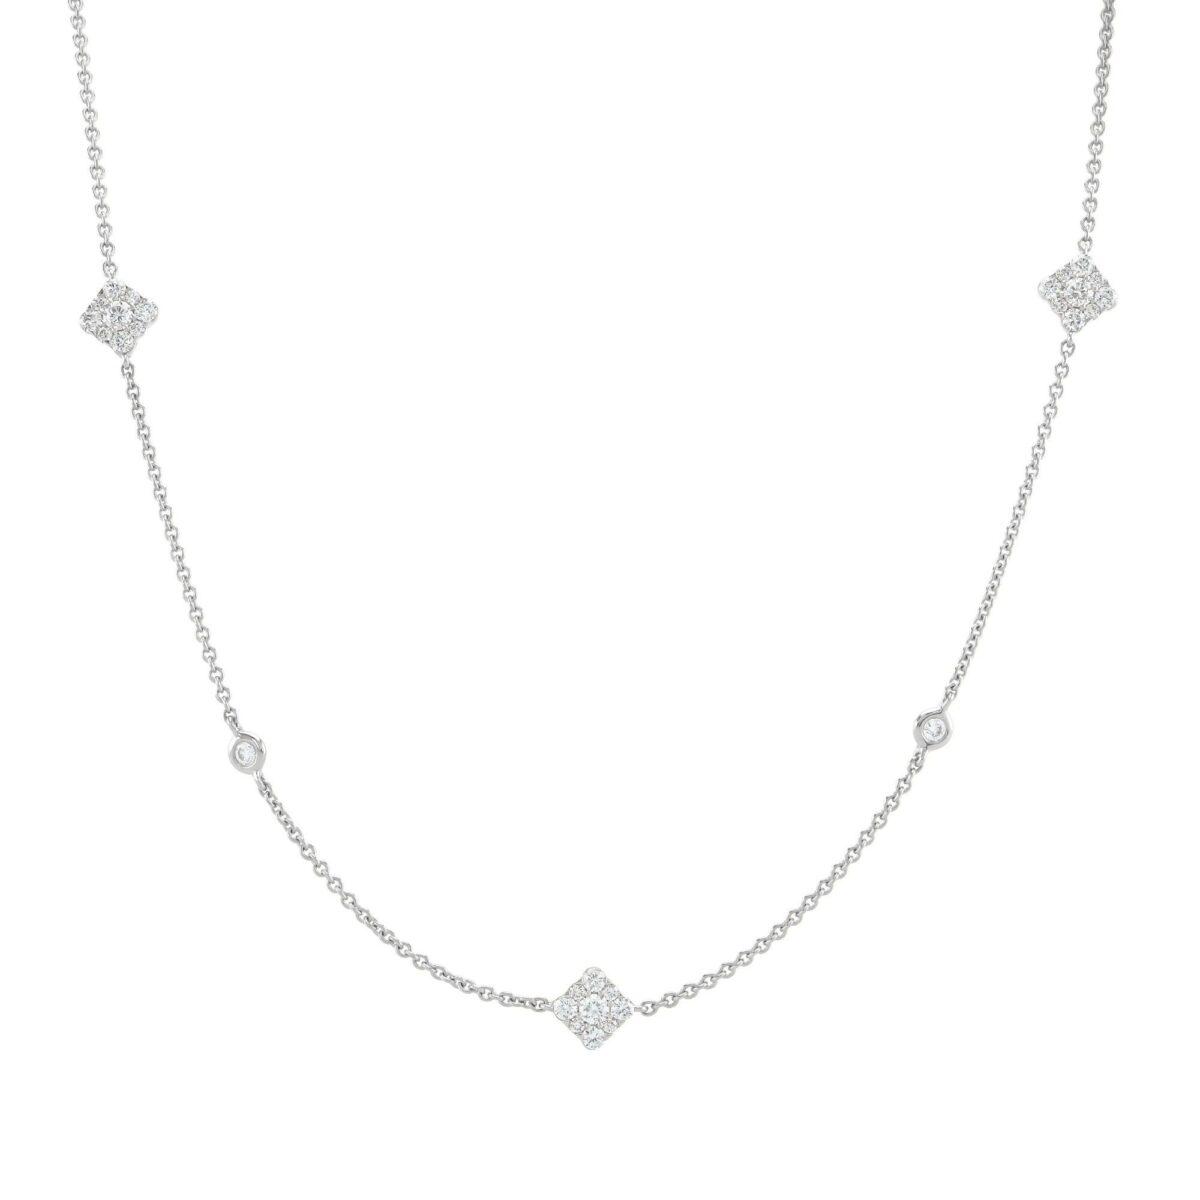 Josephine White Gold Diamond Necklace